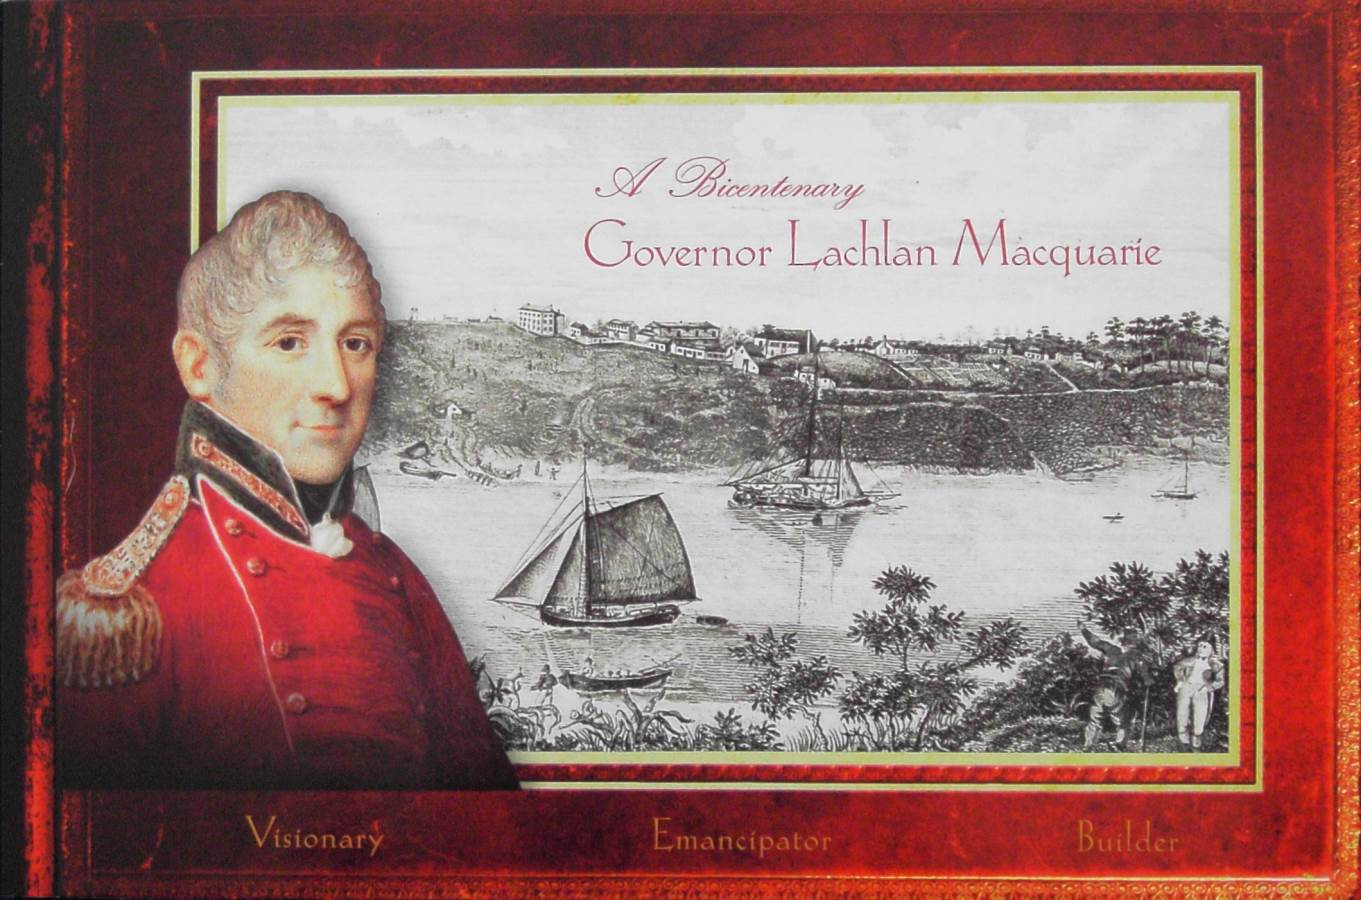 2010 Australia Post Booklet - Governor Lachlan Macquarie